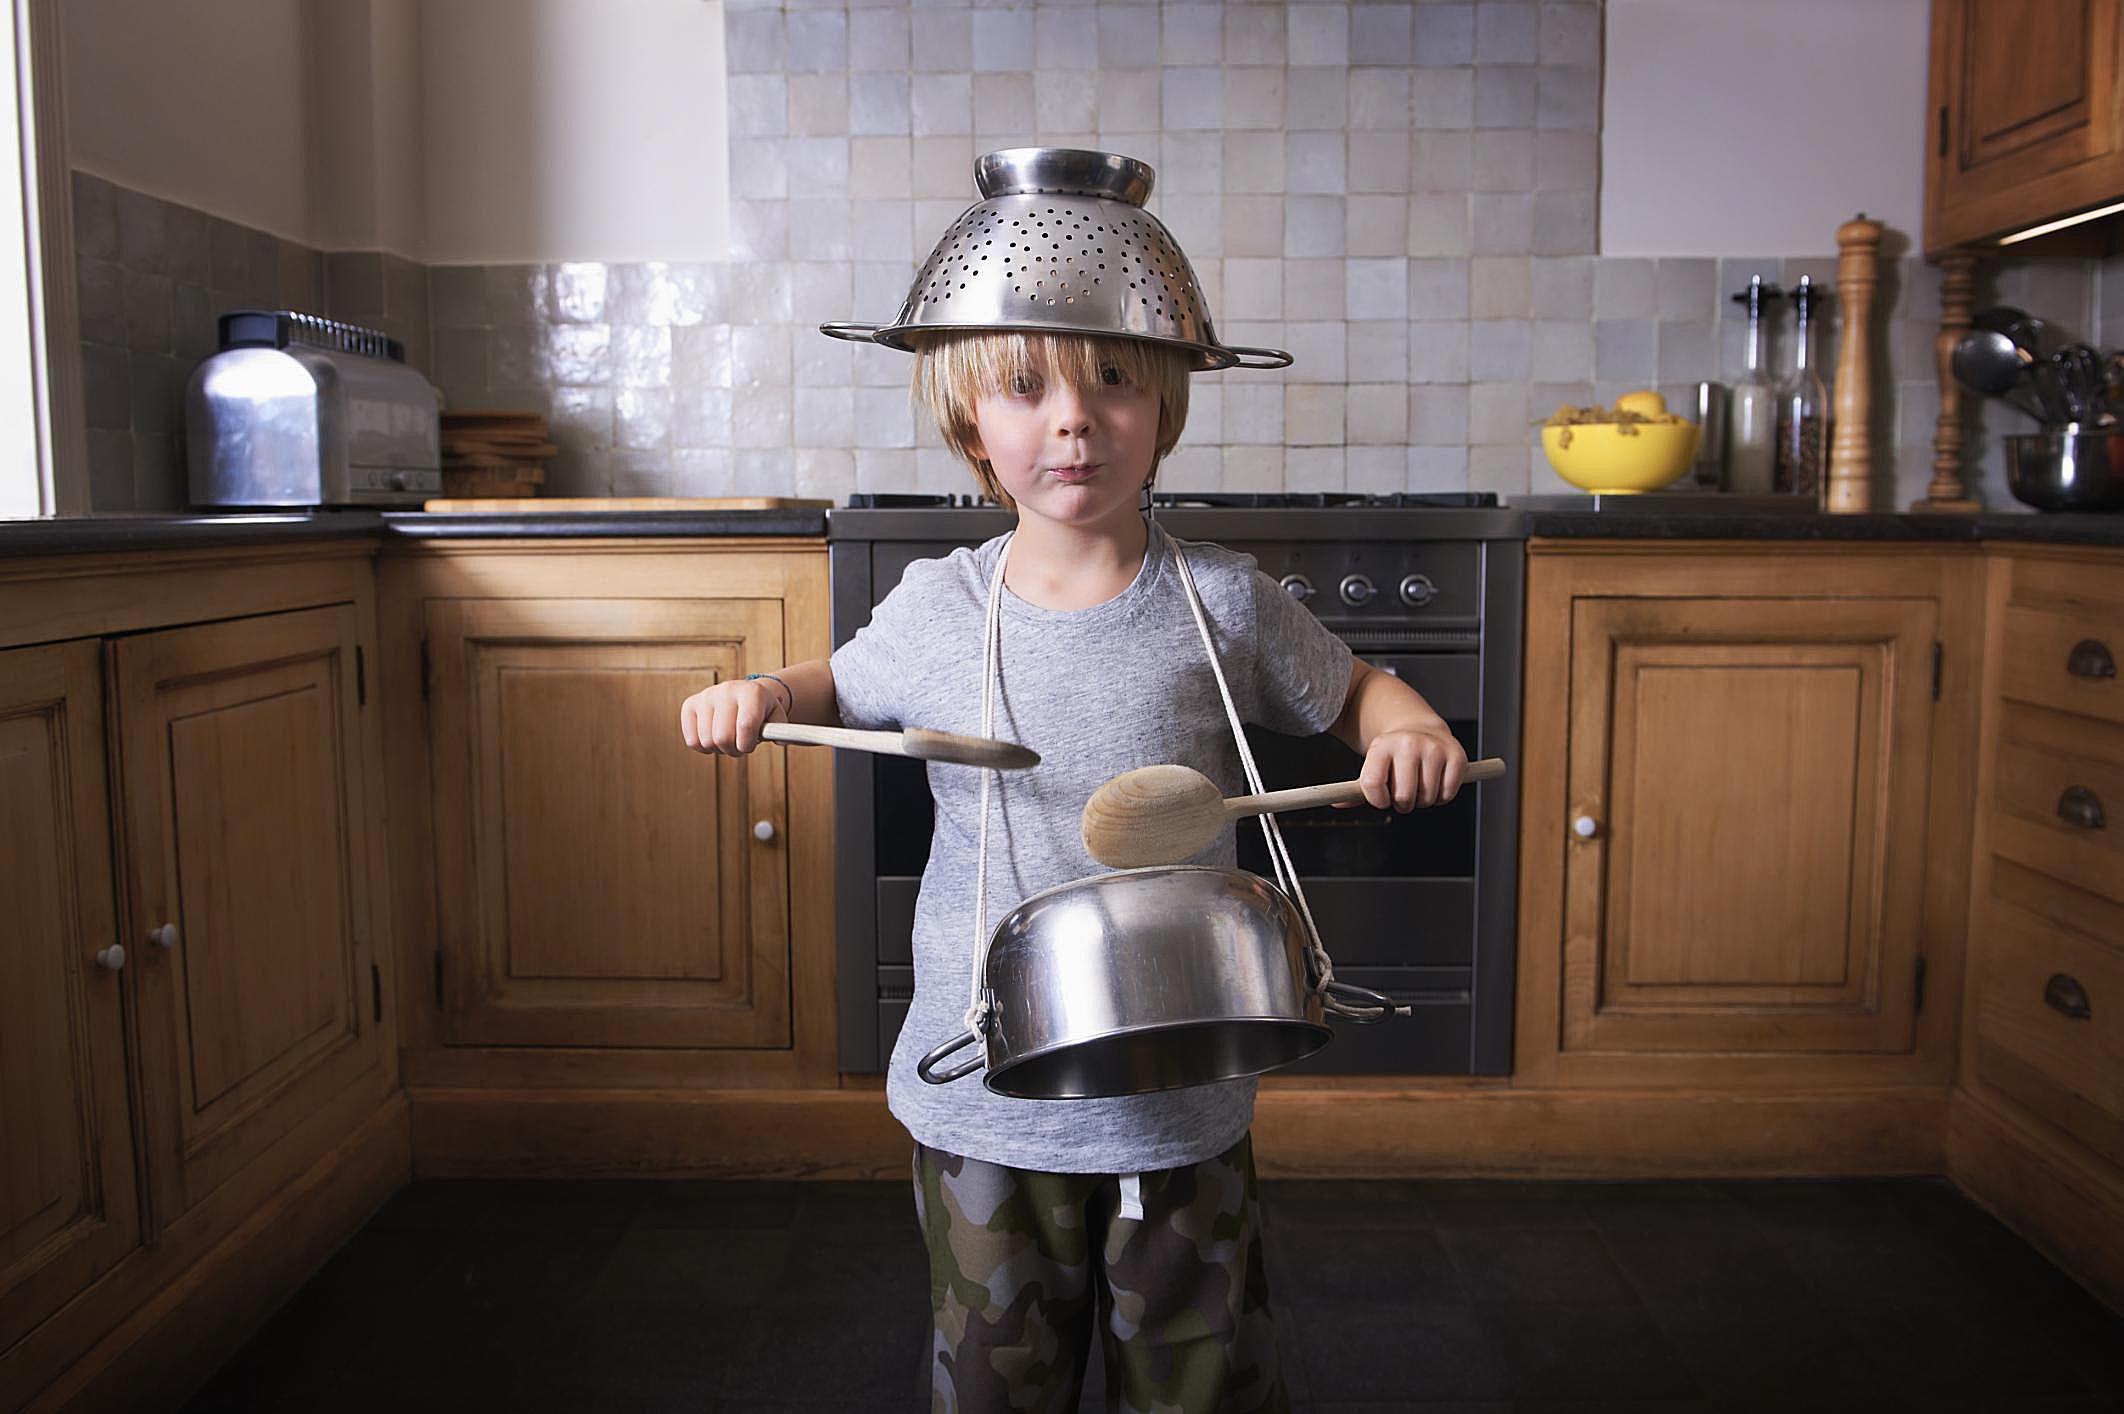 Worksheet Kitchen Safety And Sanitation